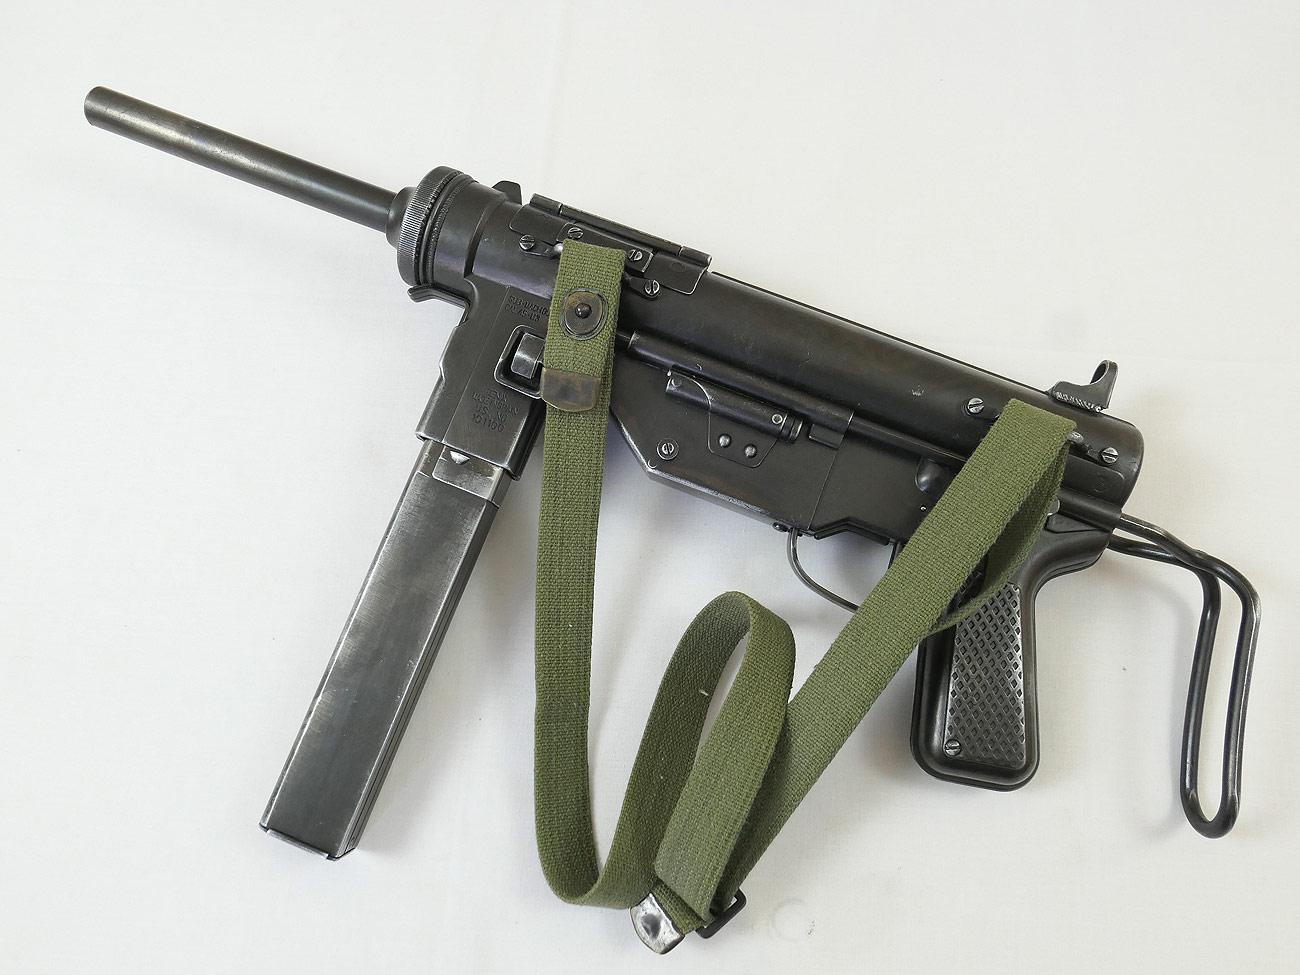 Grease Gun LUXUS SET - US ARMY WW2 M3 Submachine Gun Cal 45 Deko Modell  Filmwaffe Maschinenpistole